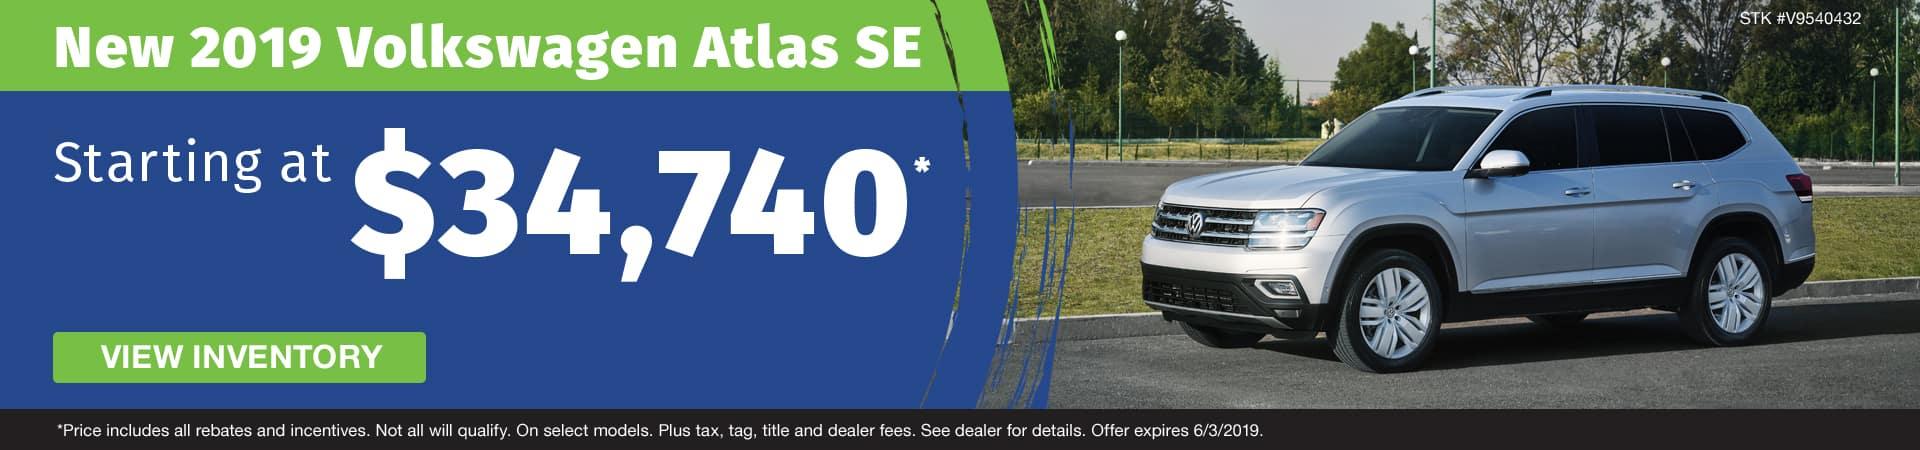 Get a new 2019 VW Atlas SE starting at $34,740 in Murfreesboro TN